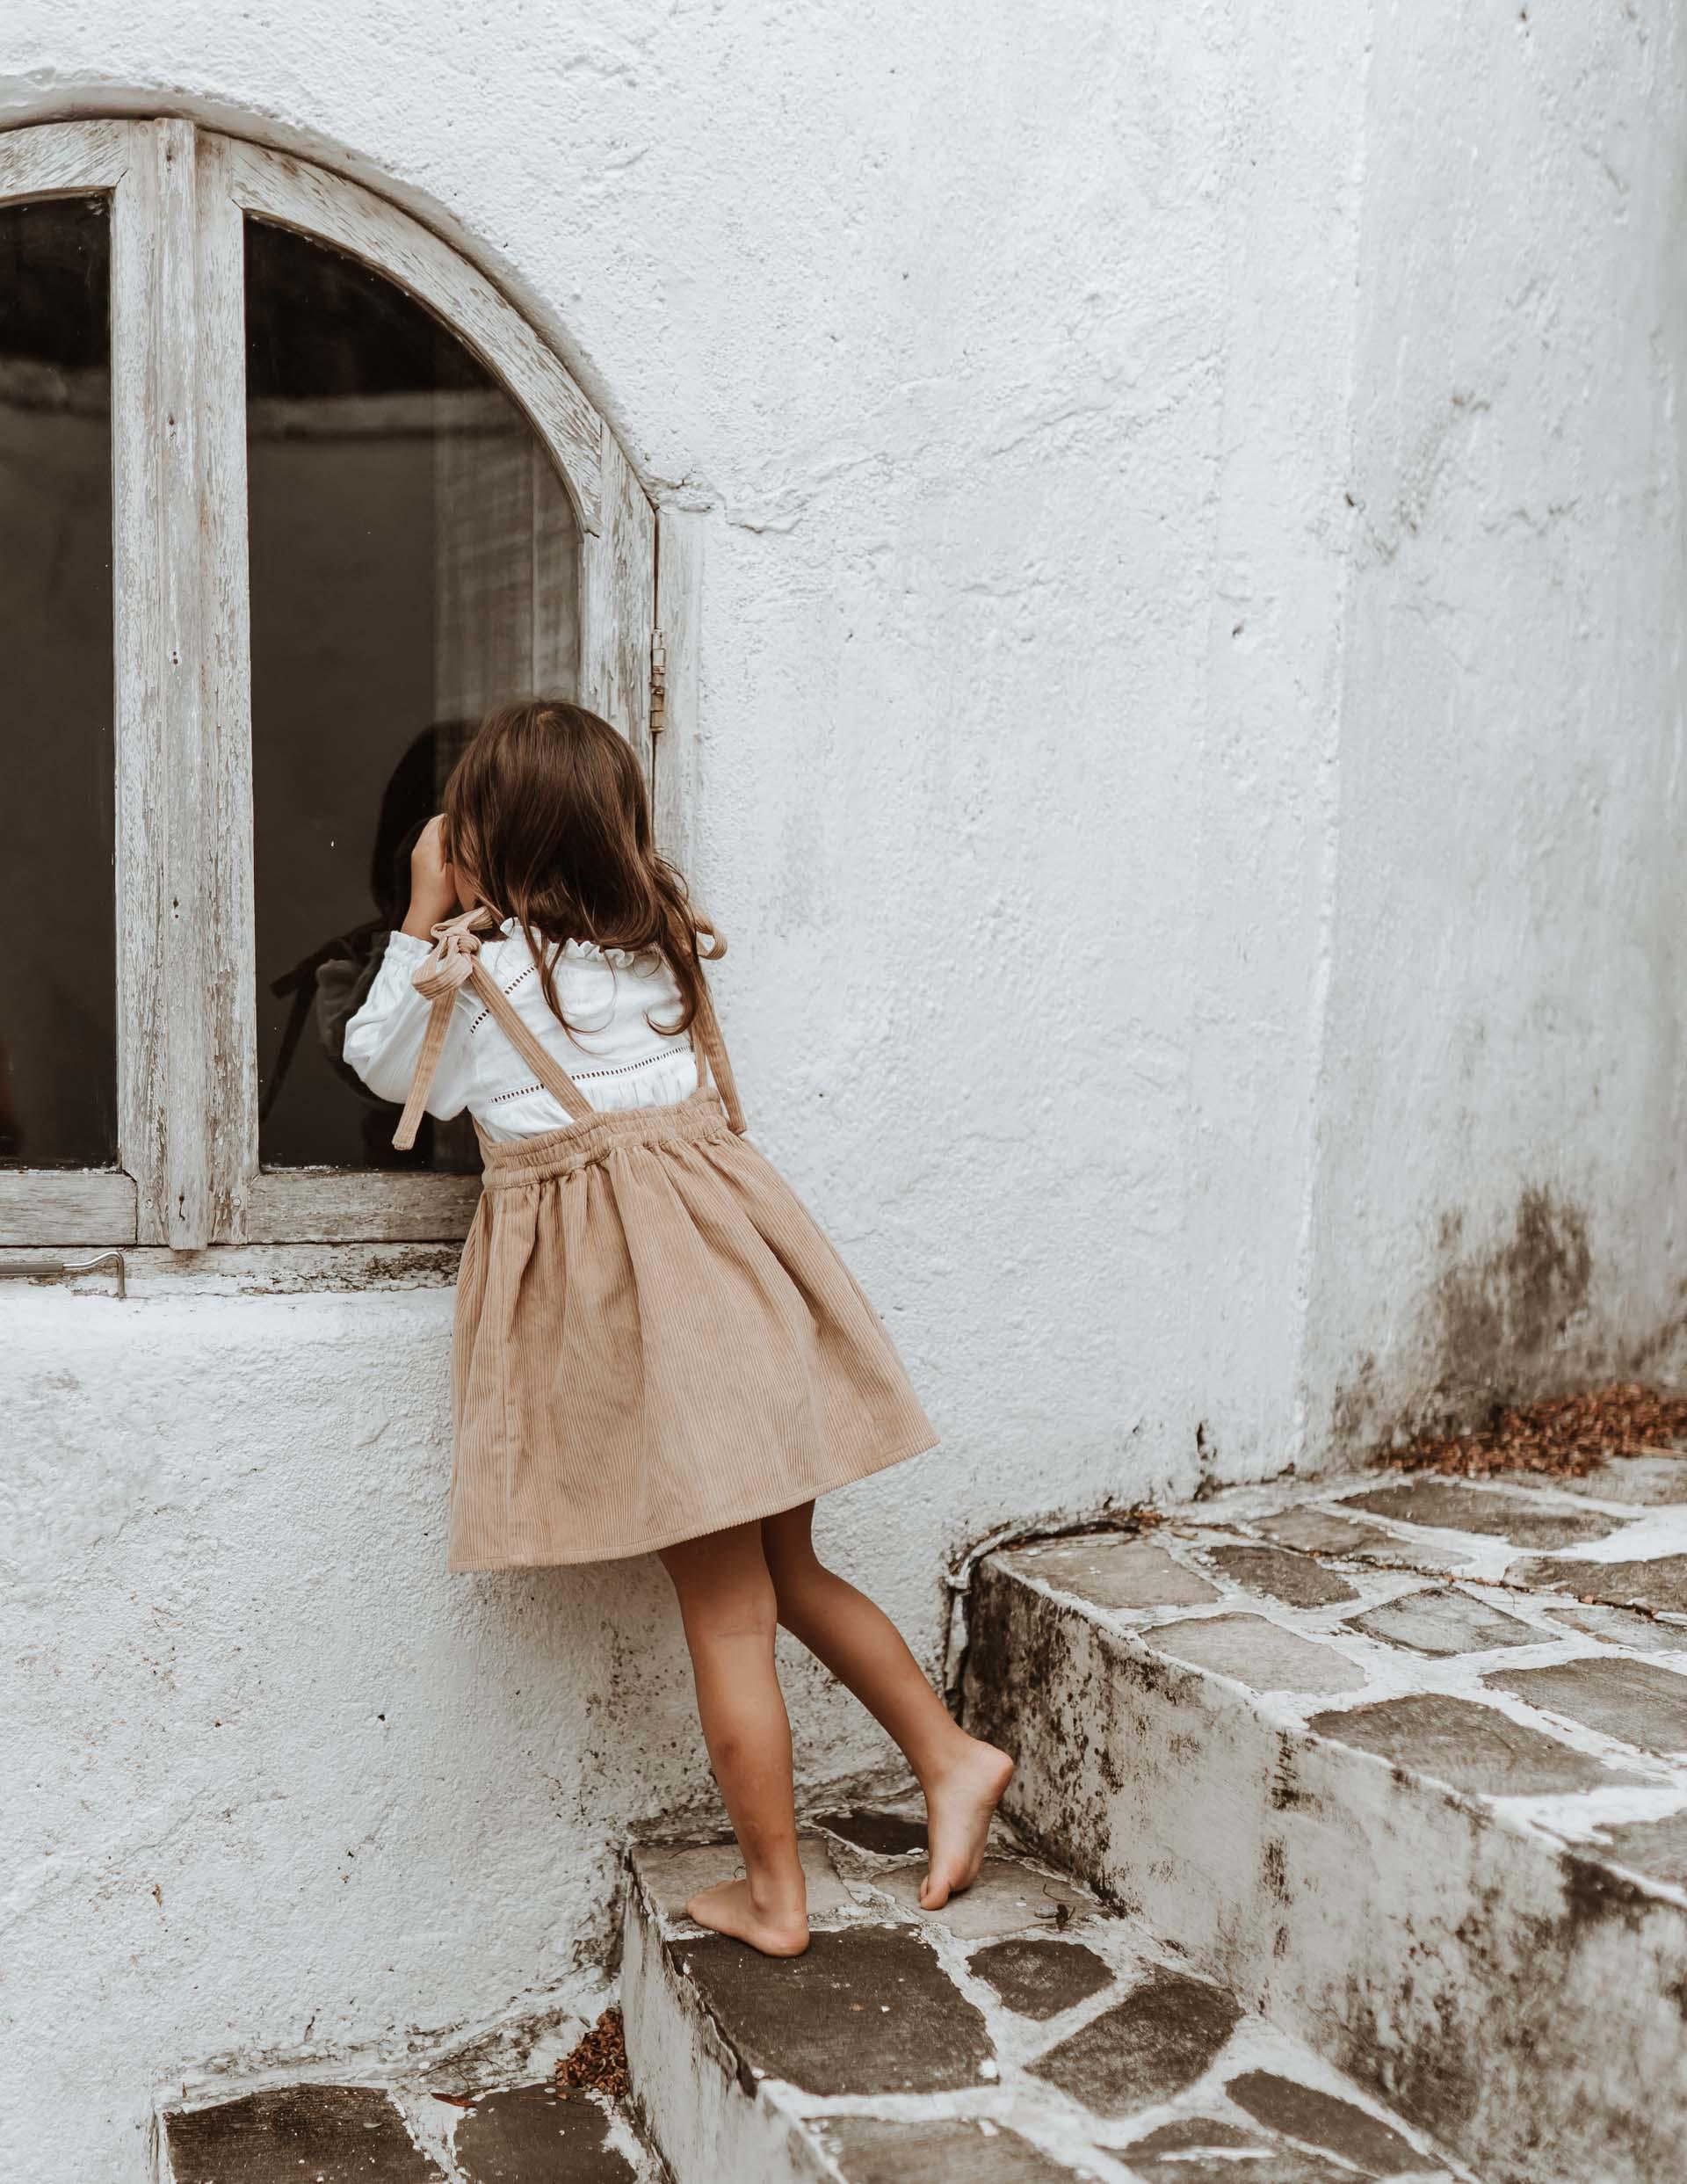 keira-mason-illoura-the-label-girl-looking-in-wondow-in-dress.jpg